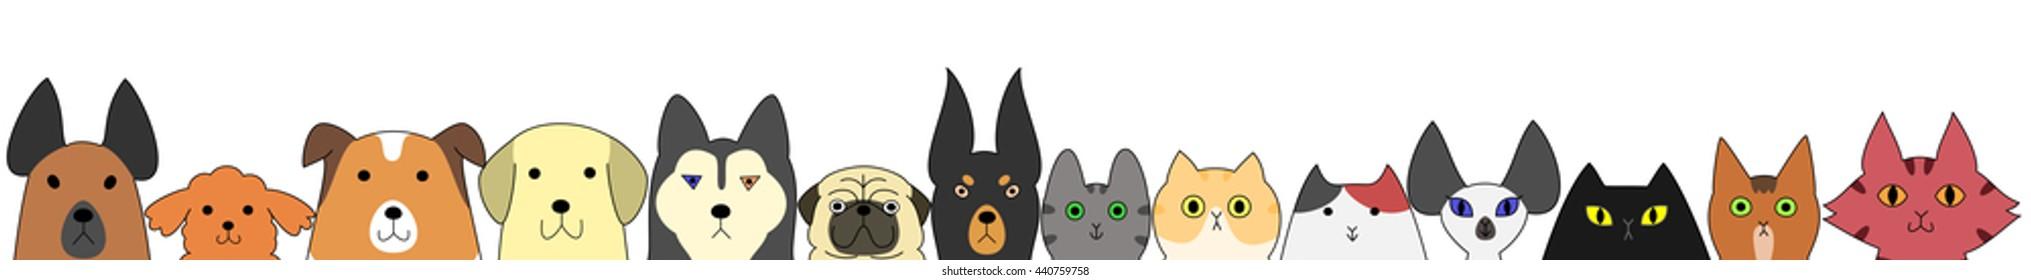 Dog Banner Images Stock Photos Vectors Shutterstock